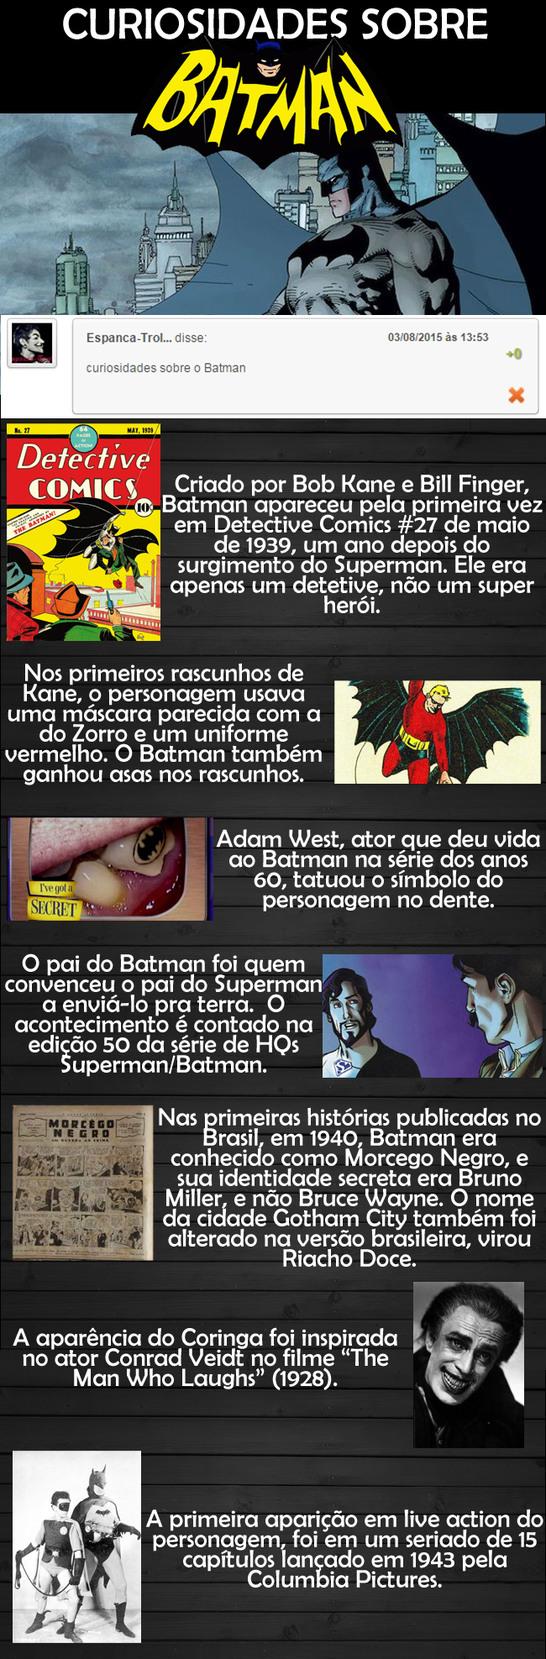 Curiosidades sobre o Batman - meme